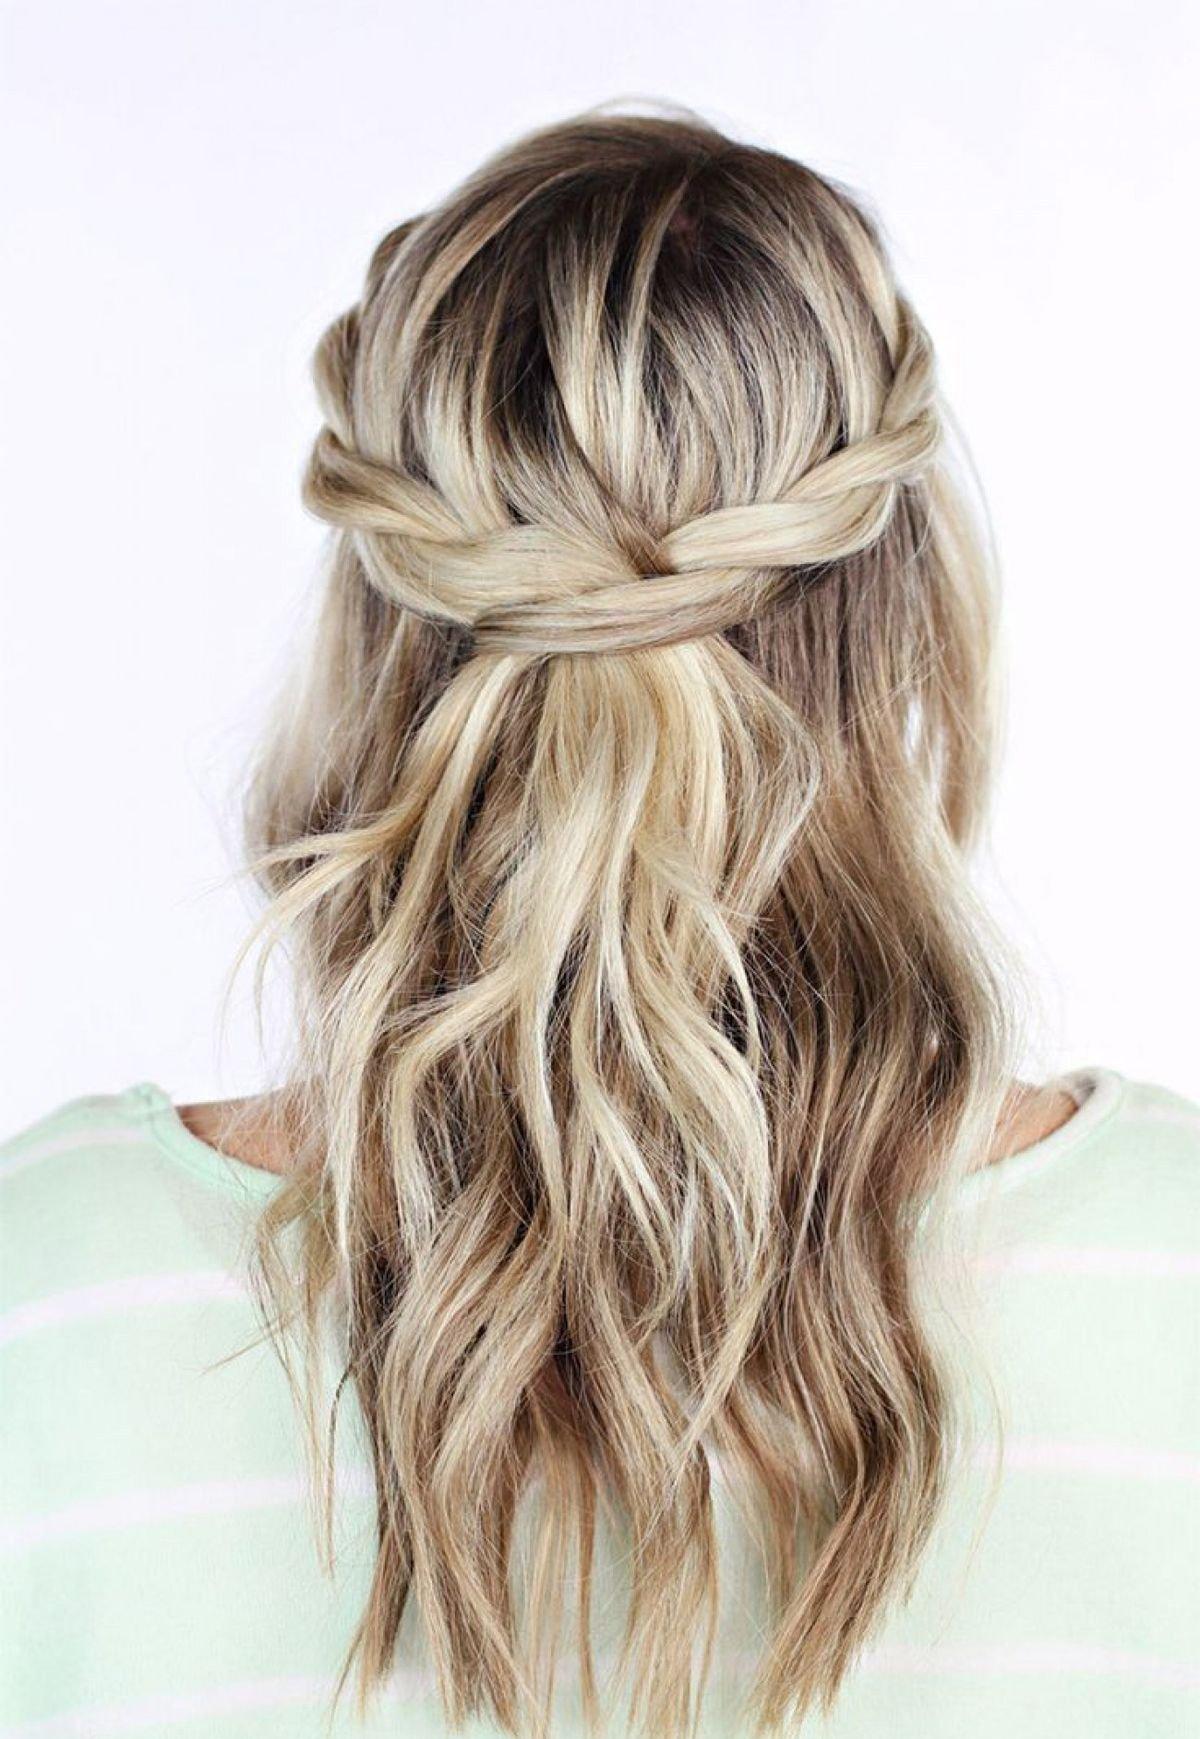 15 Peinados Con Cabello Medio Que Complementaran Tu Look